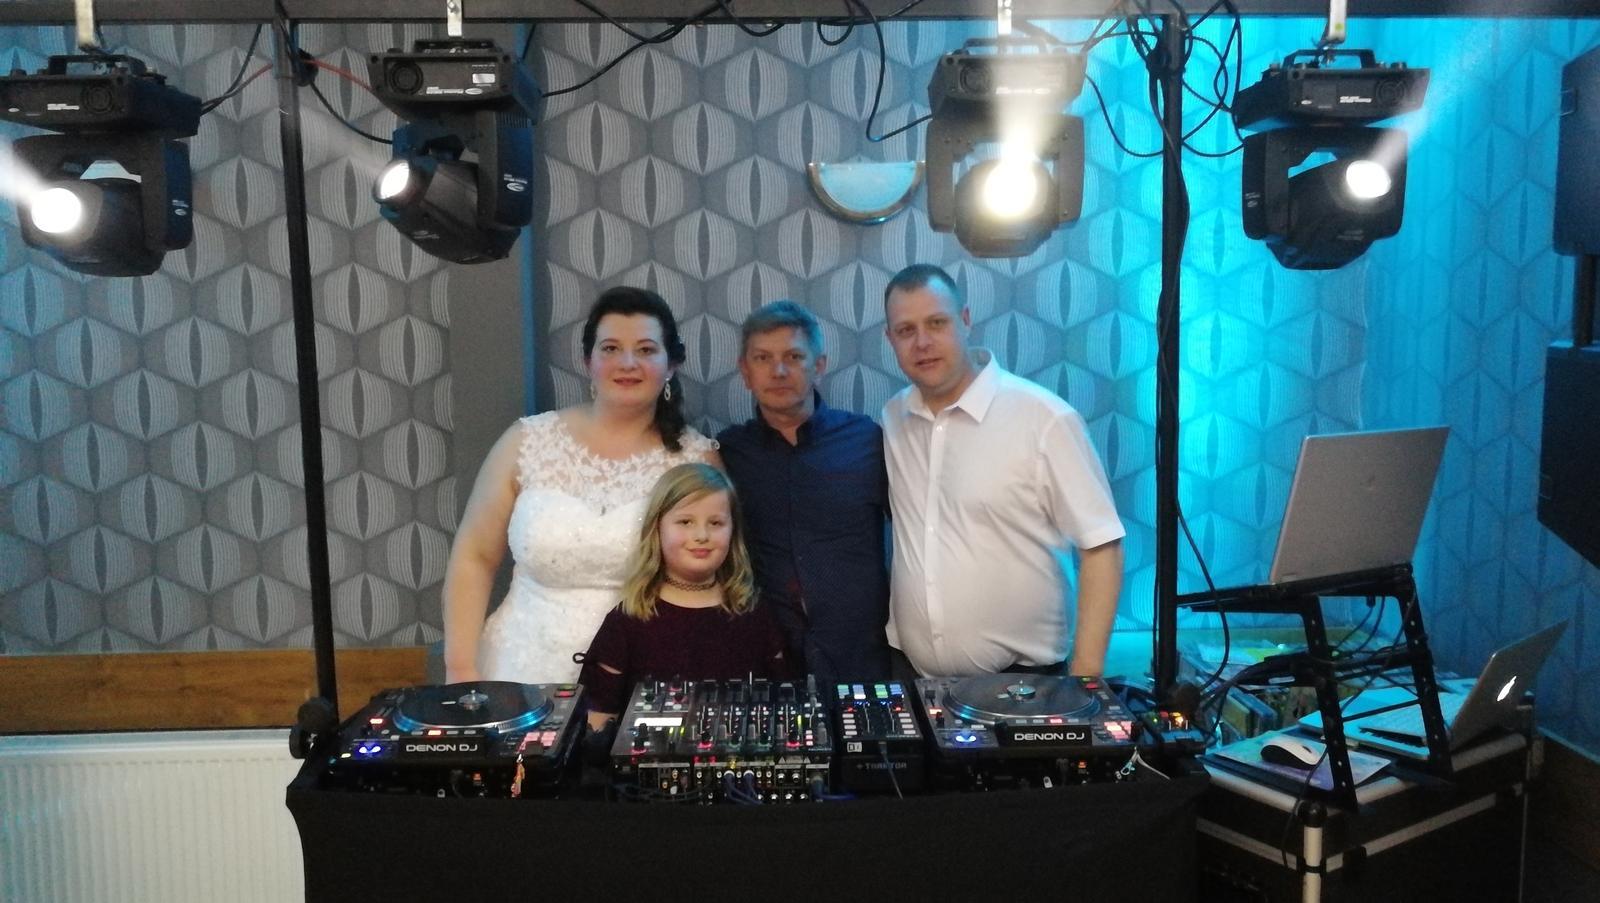 djmarco - Svadba Margita-Ilona - s mladým párom